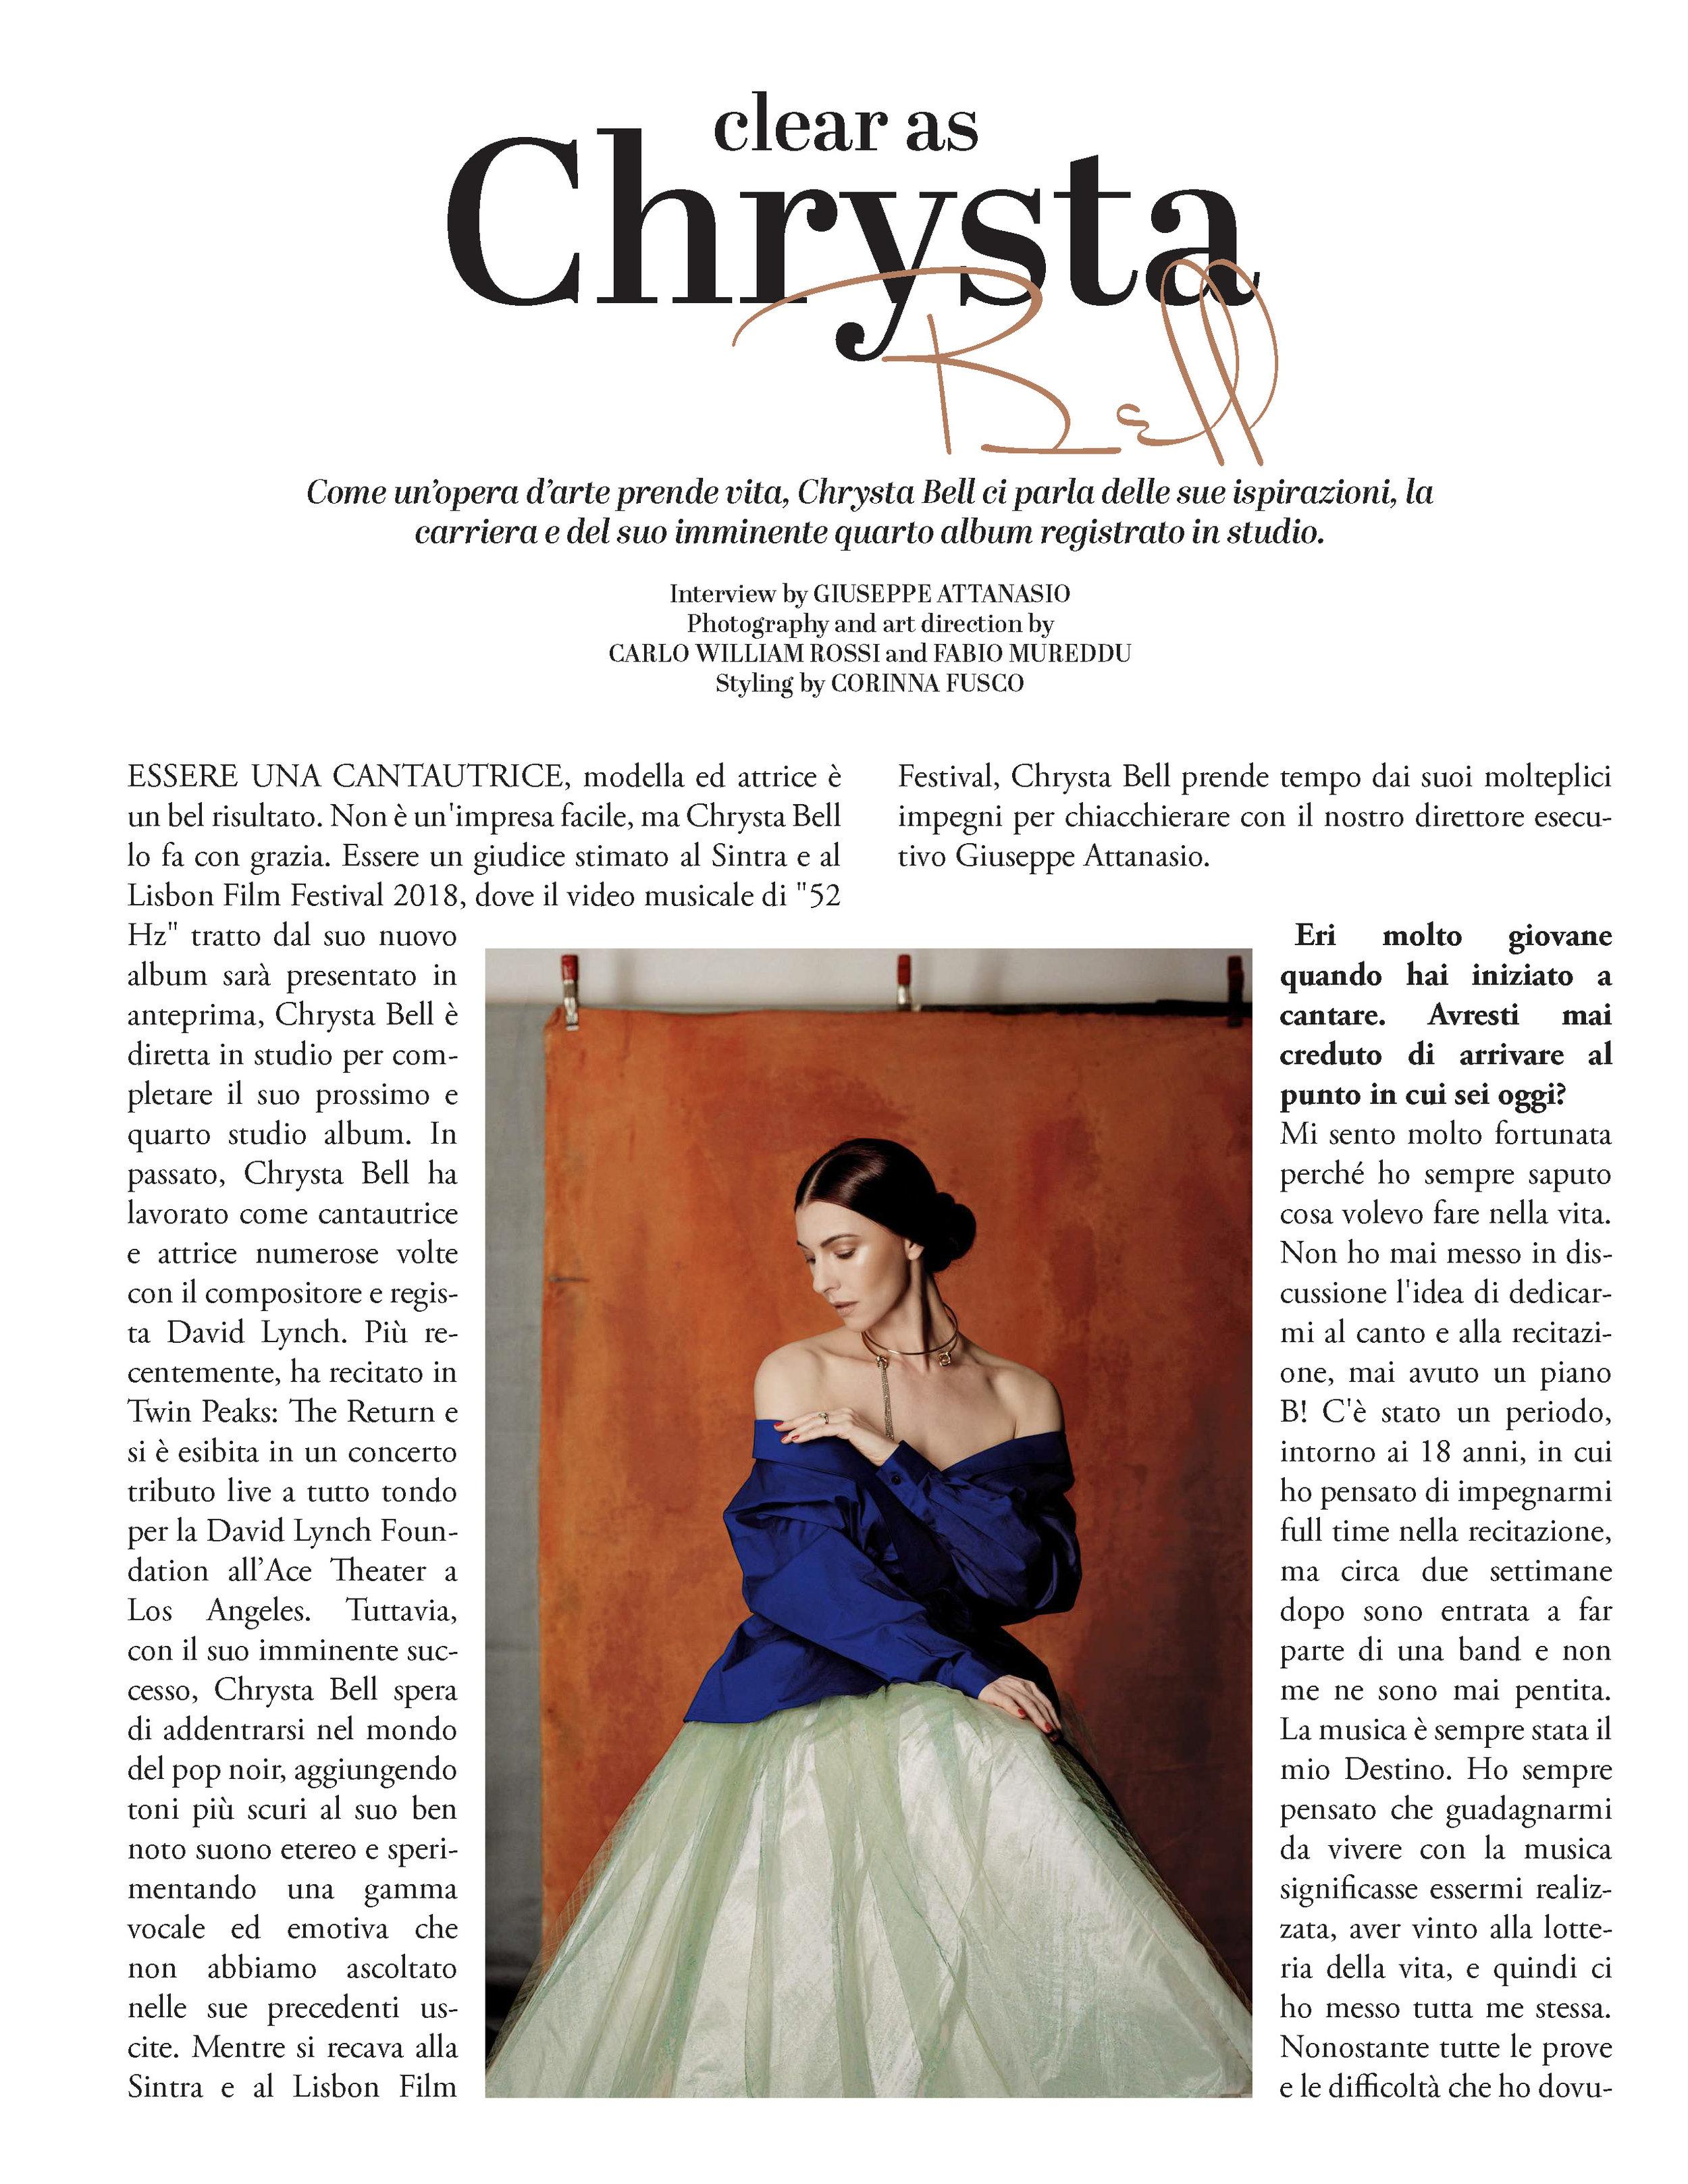 DesnudoMagazineItaliaIssue1ChrystaBellCover_Pagina_109.jpg